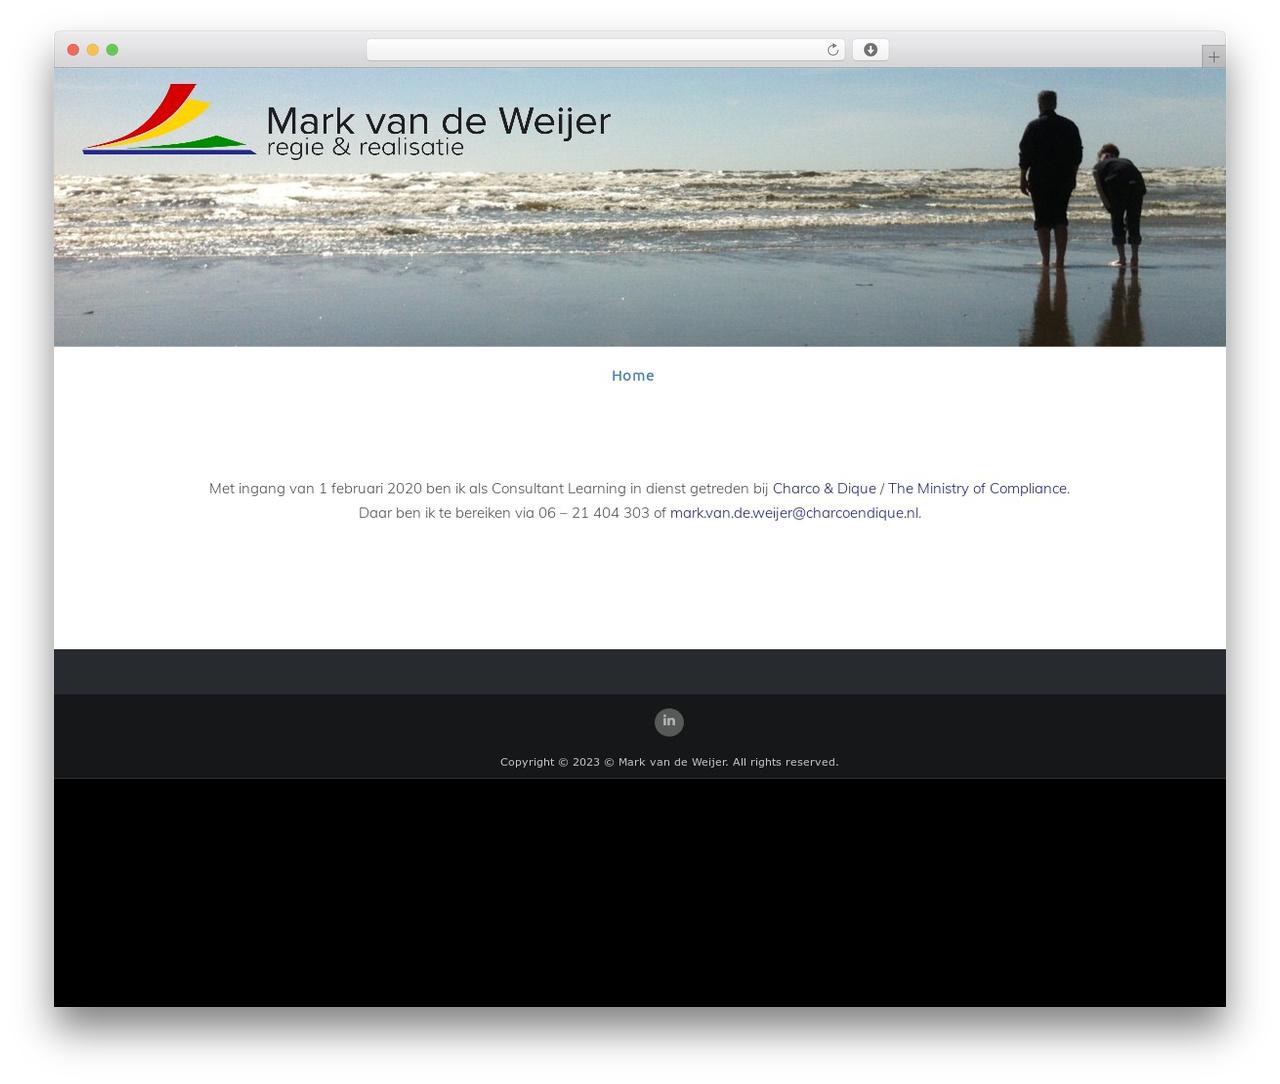 WP theme Celestial - markvandeweijer.nl